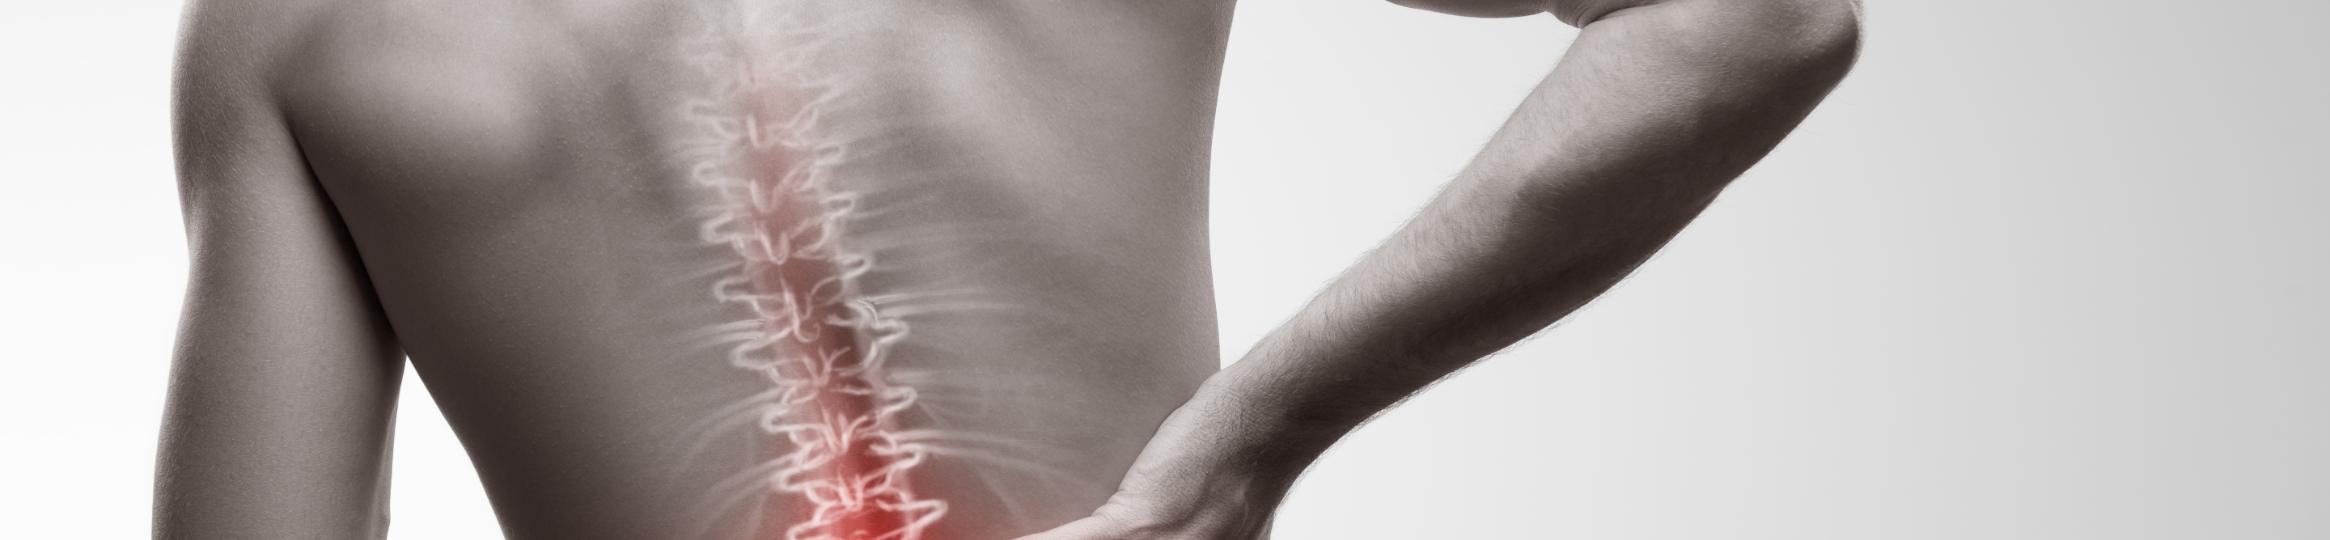 Spinal assessment